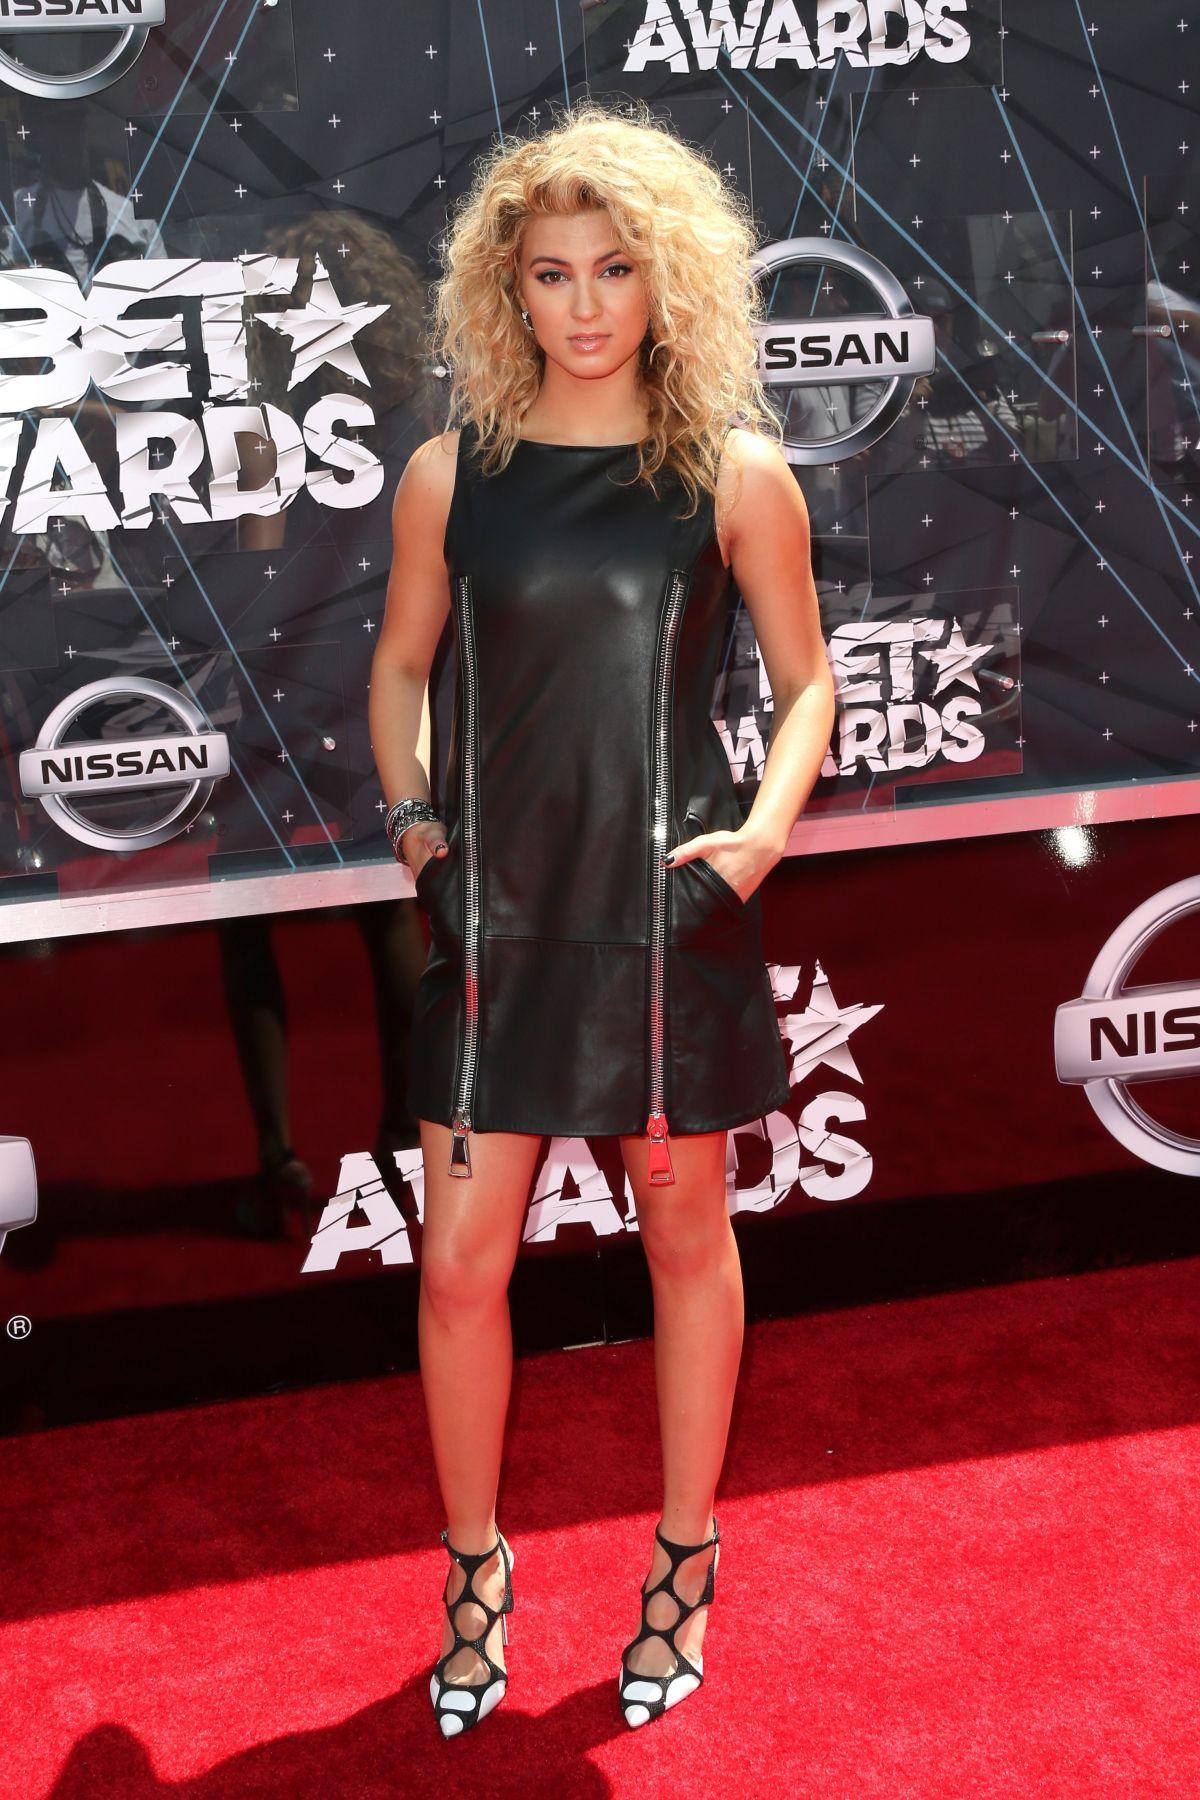 TORI KELLY at 2015 BET Awards in Los Angeles